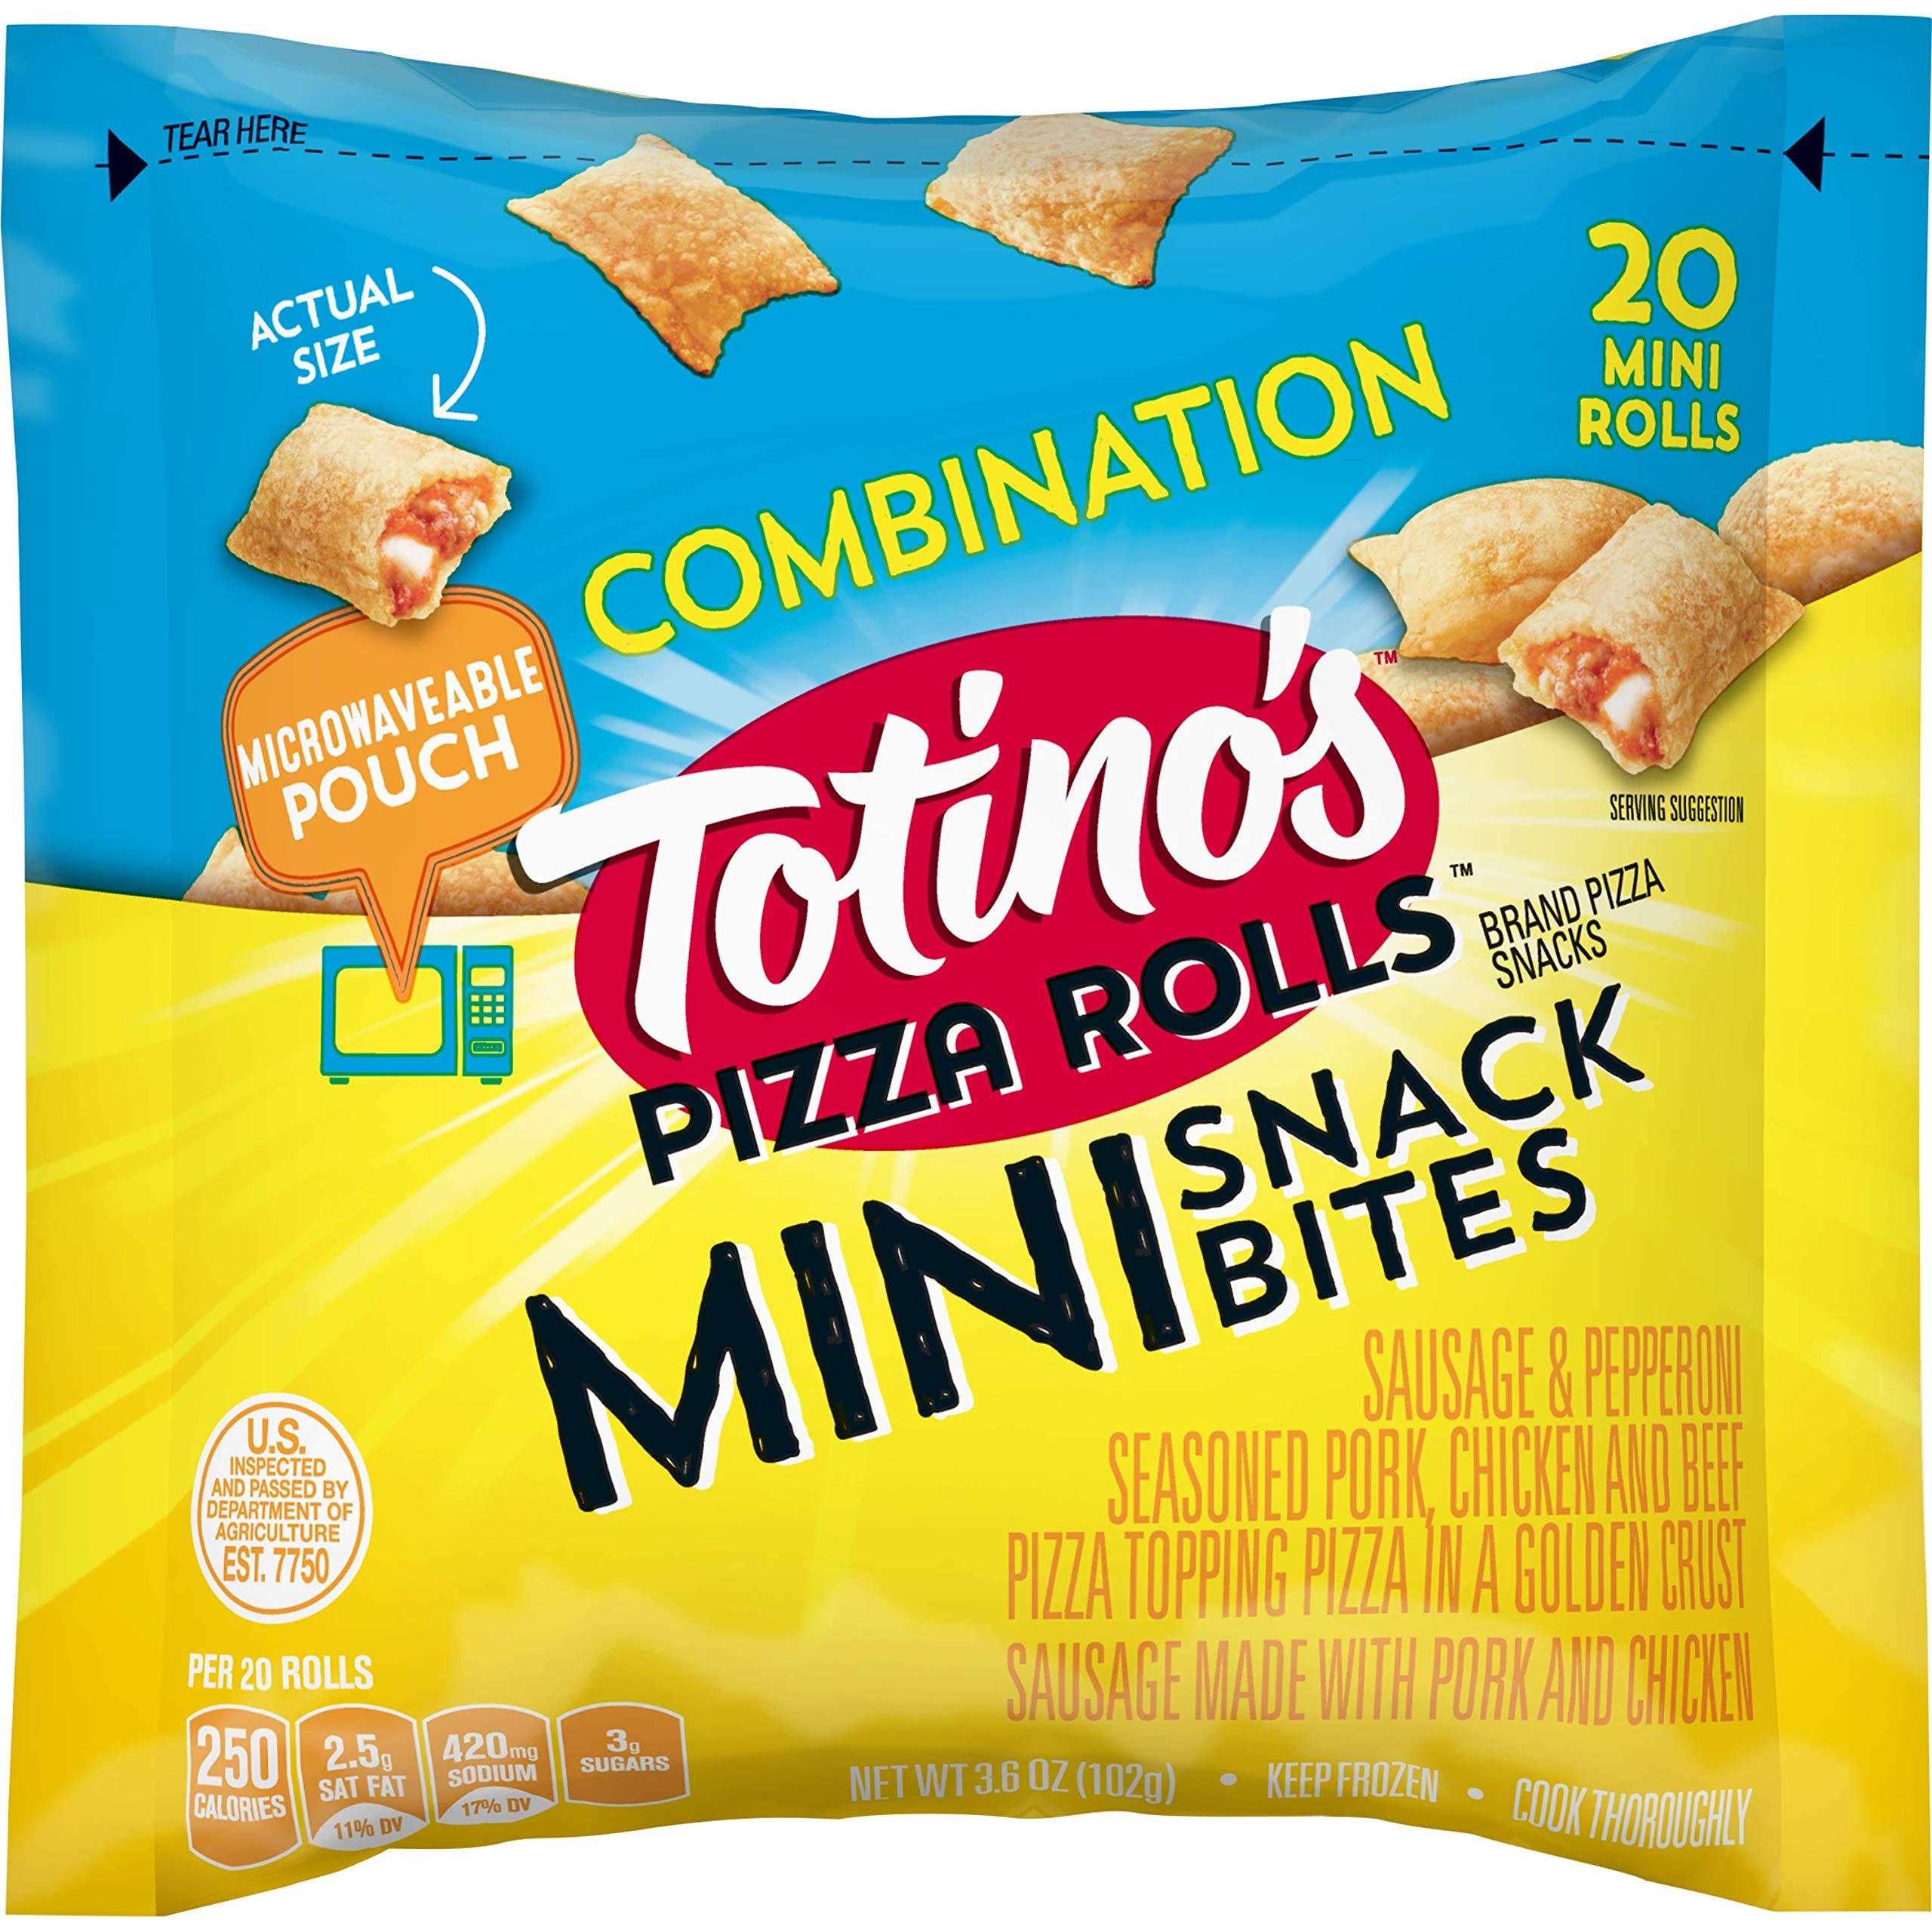 Totino's Pizza Rolls Mini, Combination, 20 Rolls, 3.6 oz Bag (frozen)